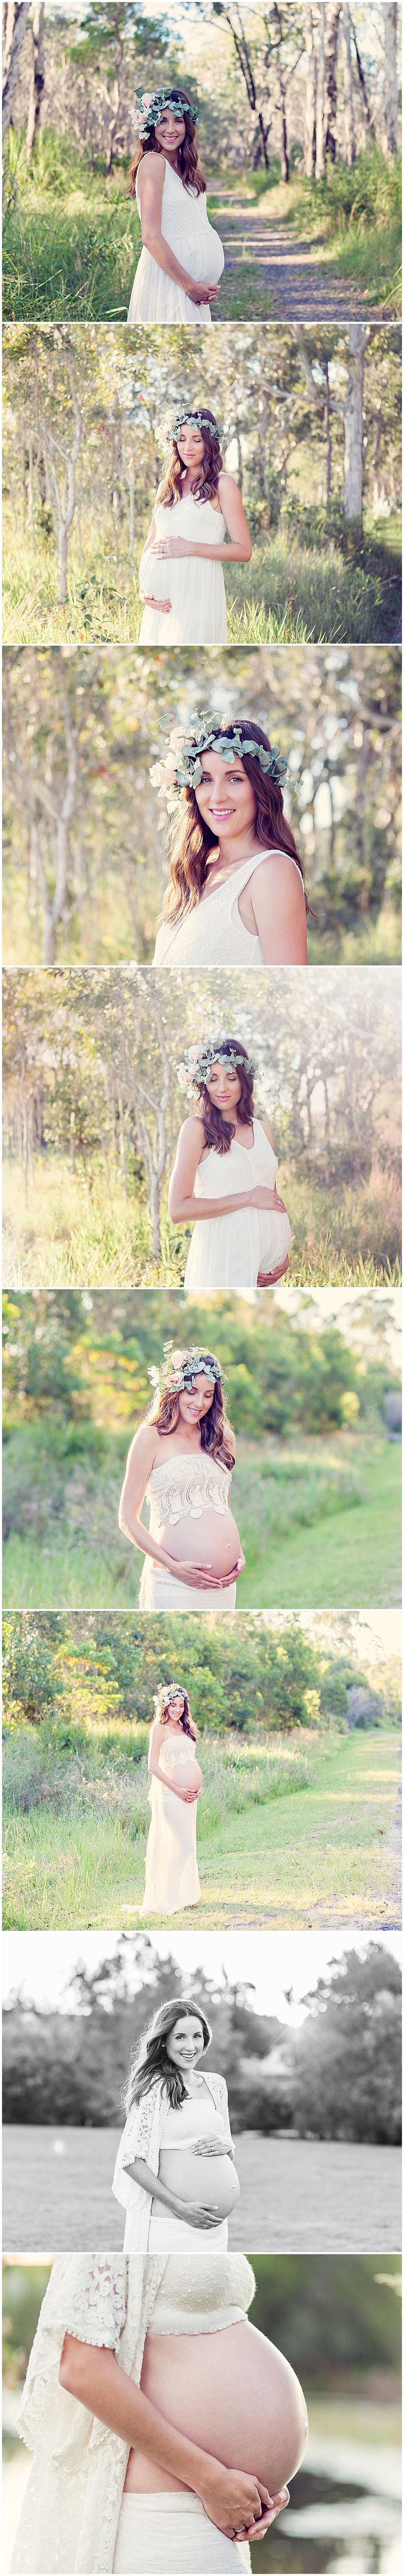 Michele Bird Photography ~ Sunshine Coast Maternity Photographer